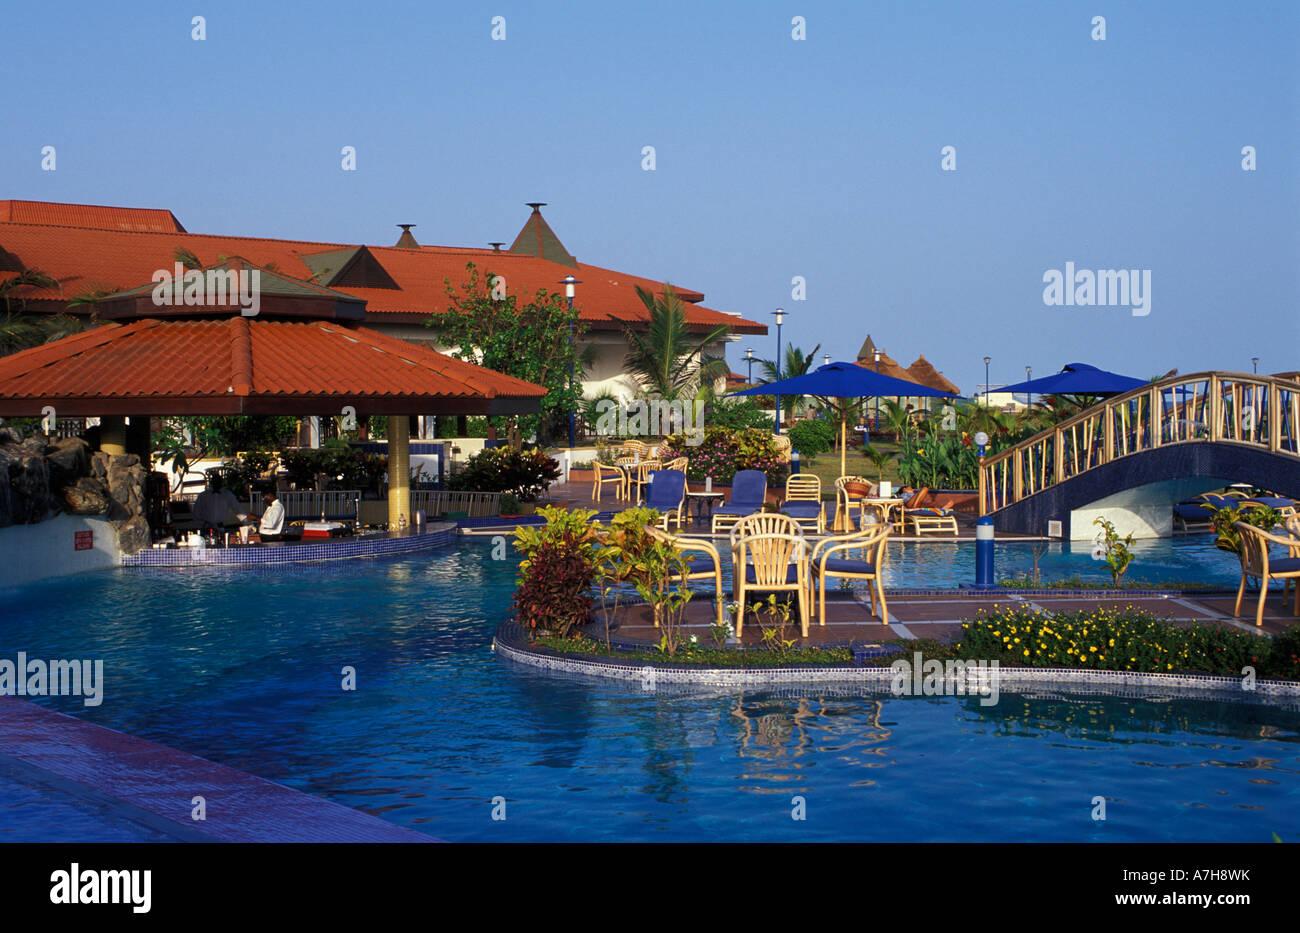 La Palm Royal Beach Hotel Swimming Pool Accra Ghana